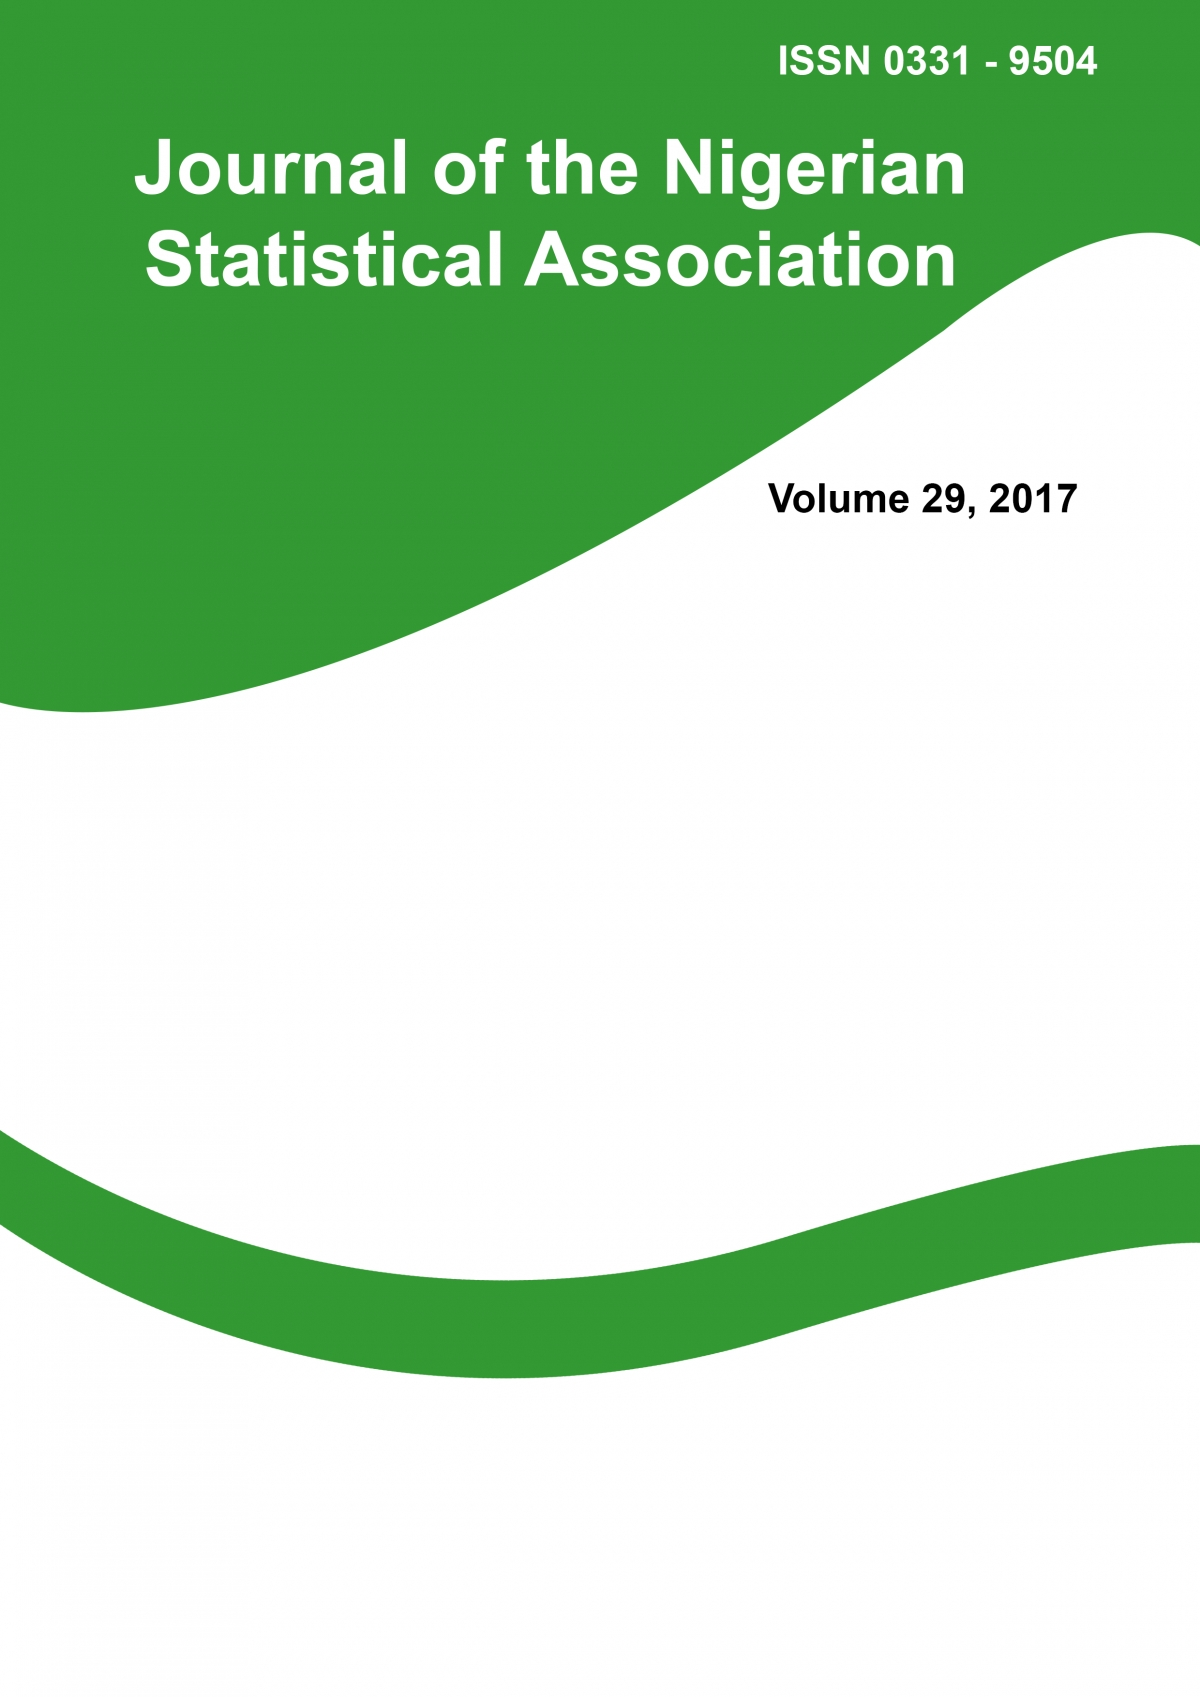 Journal of the Nigerian Statistical  Association Vol. 29, 2017